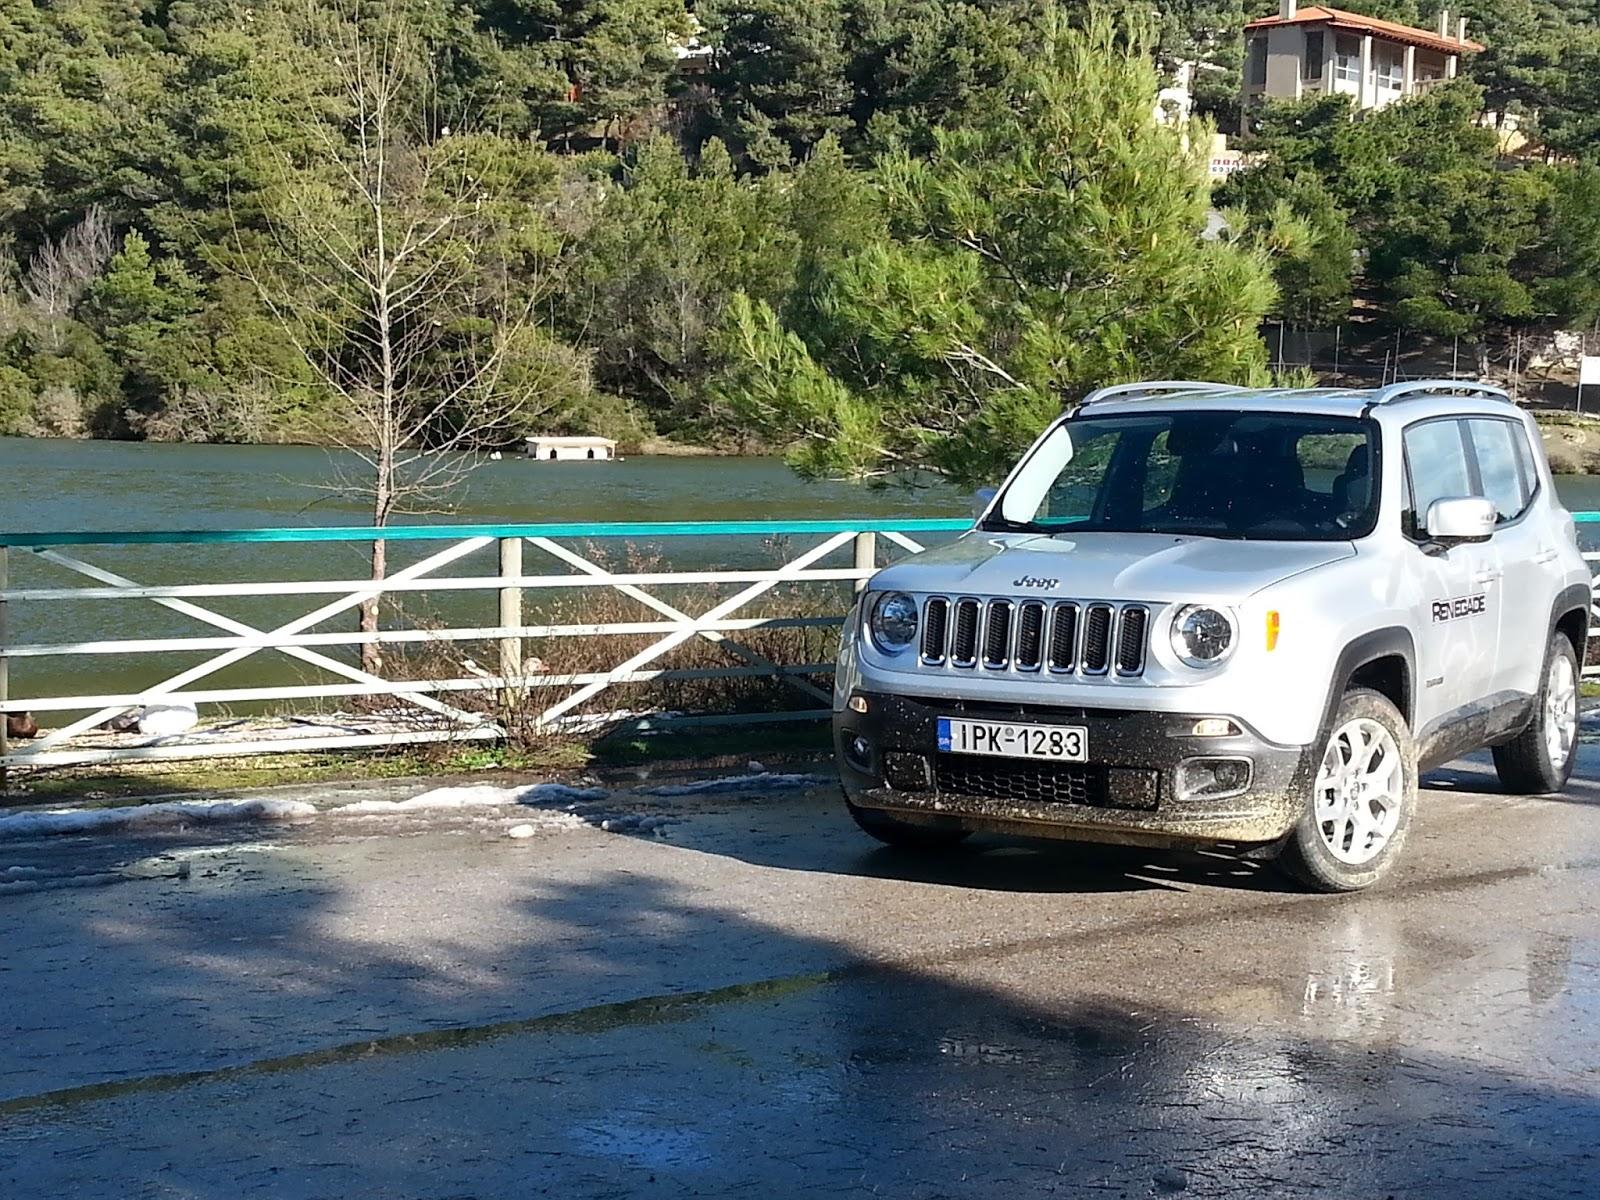 jeepren%2Btopspeed Τα 10 καλύτερα αυτοκίνητα για νέες μαμάδες topspeed.gr, zblog, μαμάδες, μητέρες, μωρά